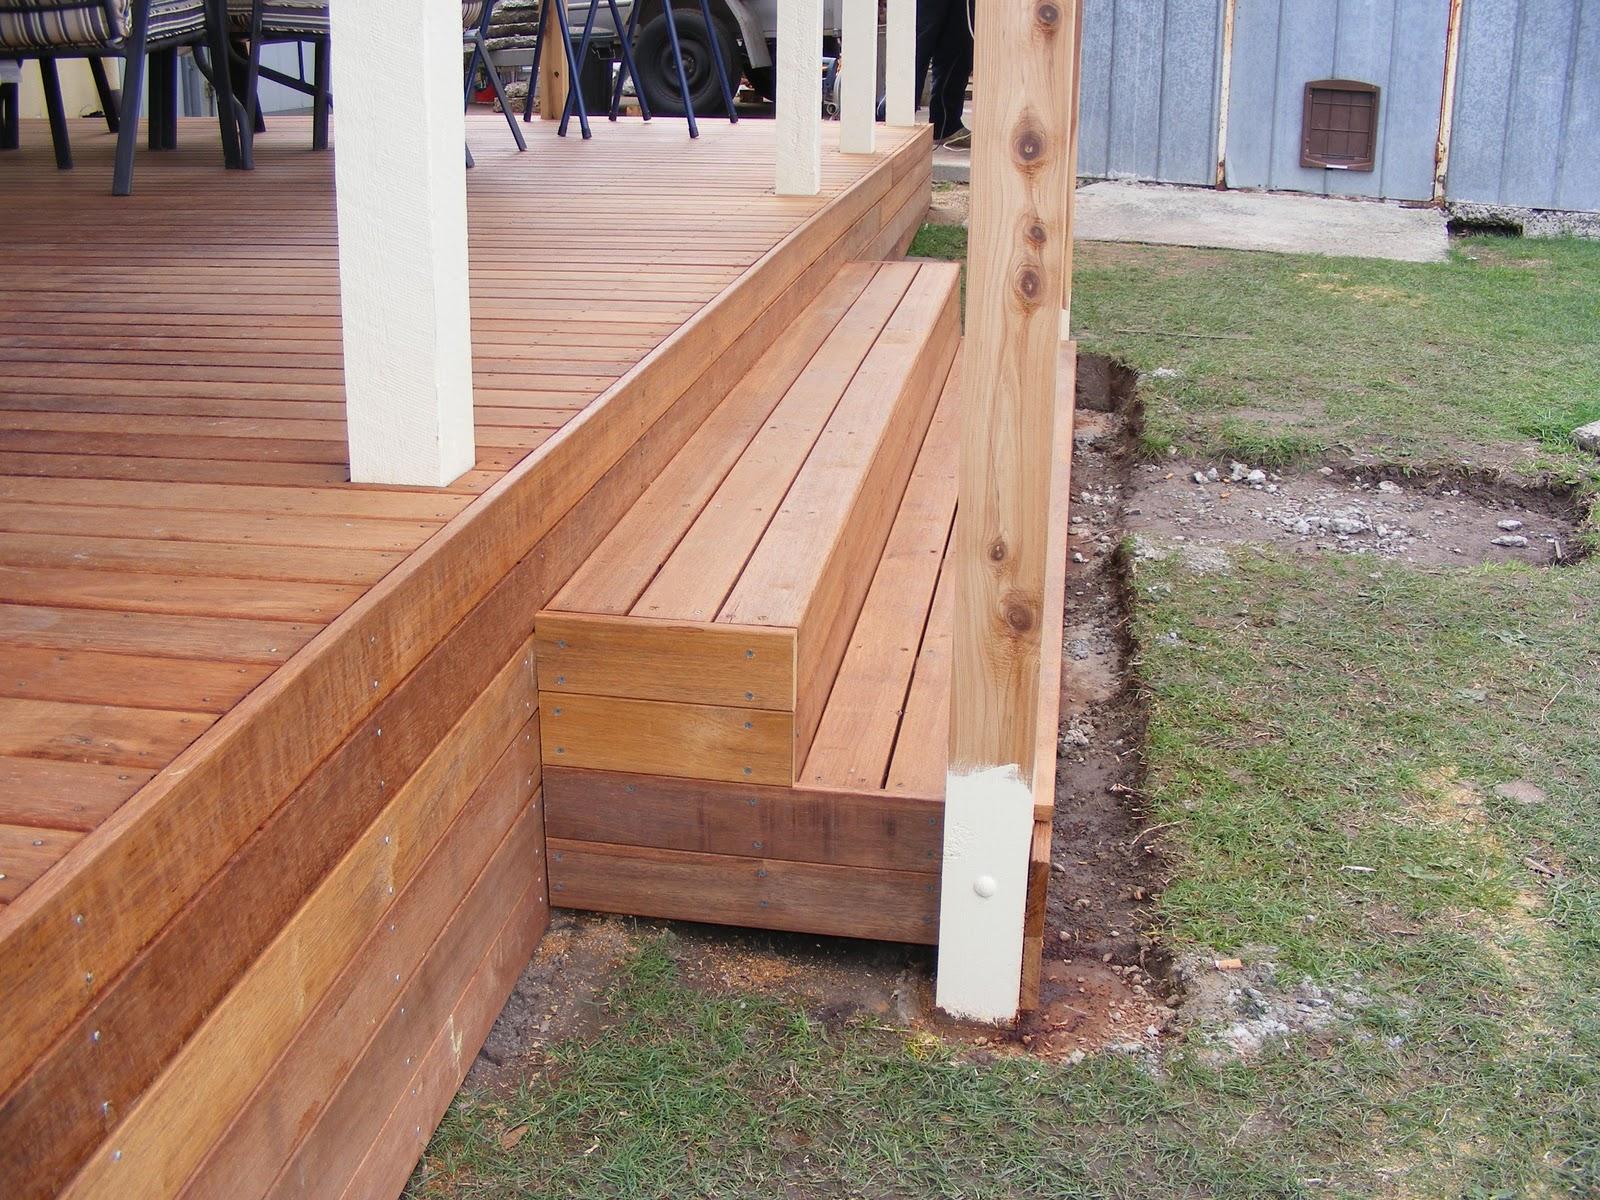 Waynes Home Renos Diy Building Deck Part 3 Stairs   Making Steps For Decking